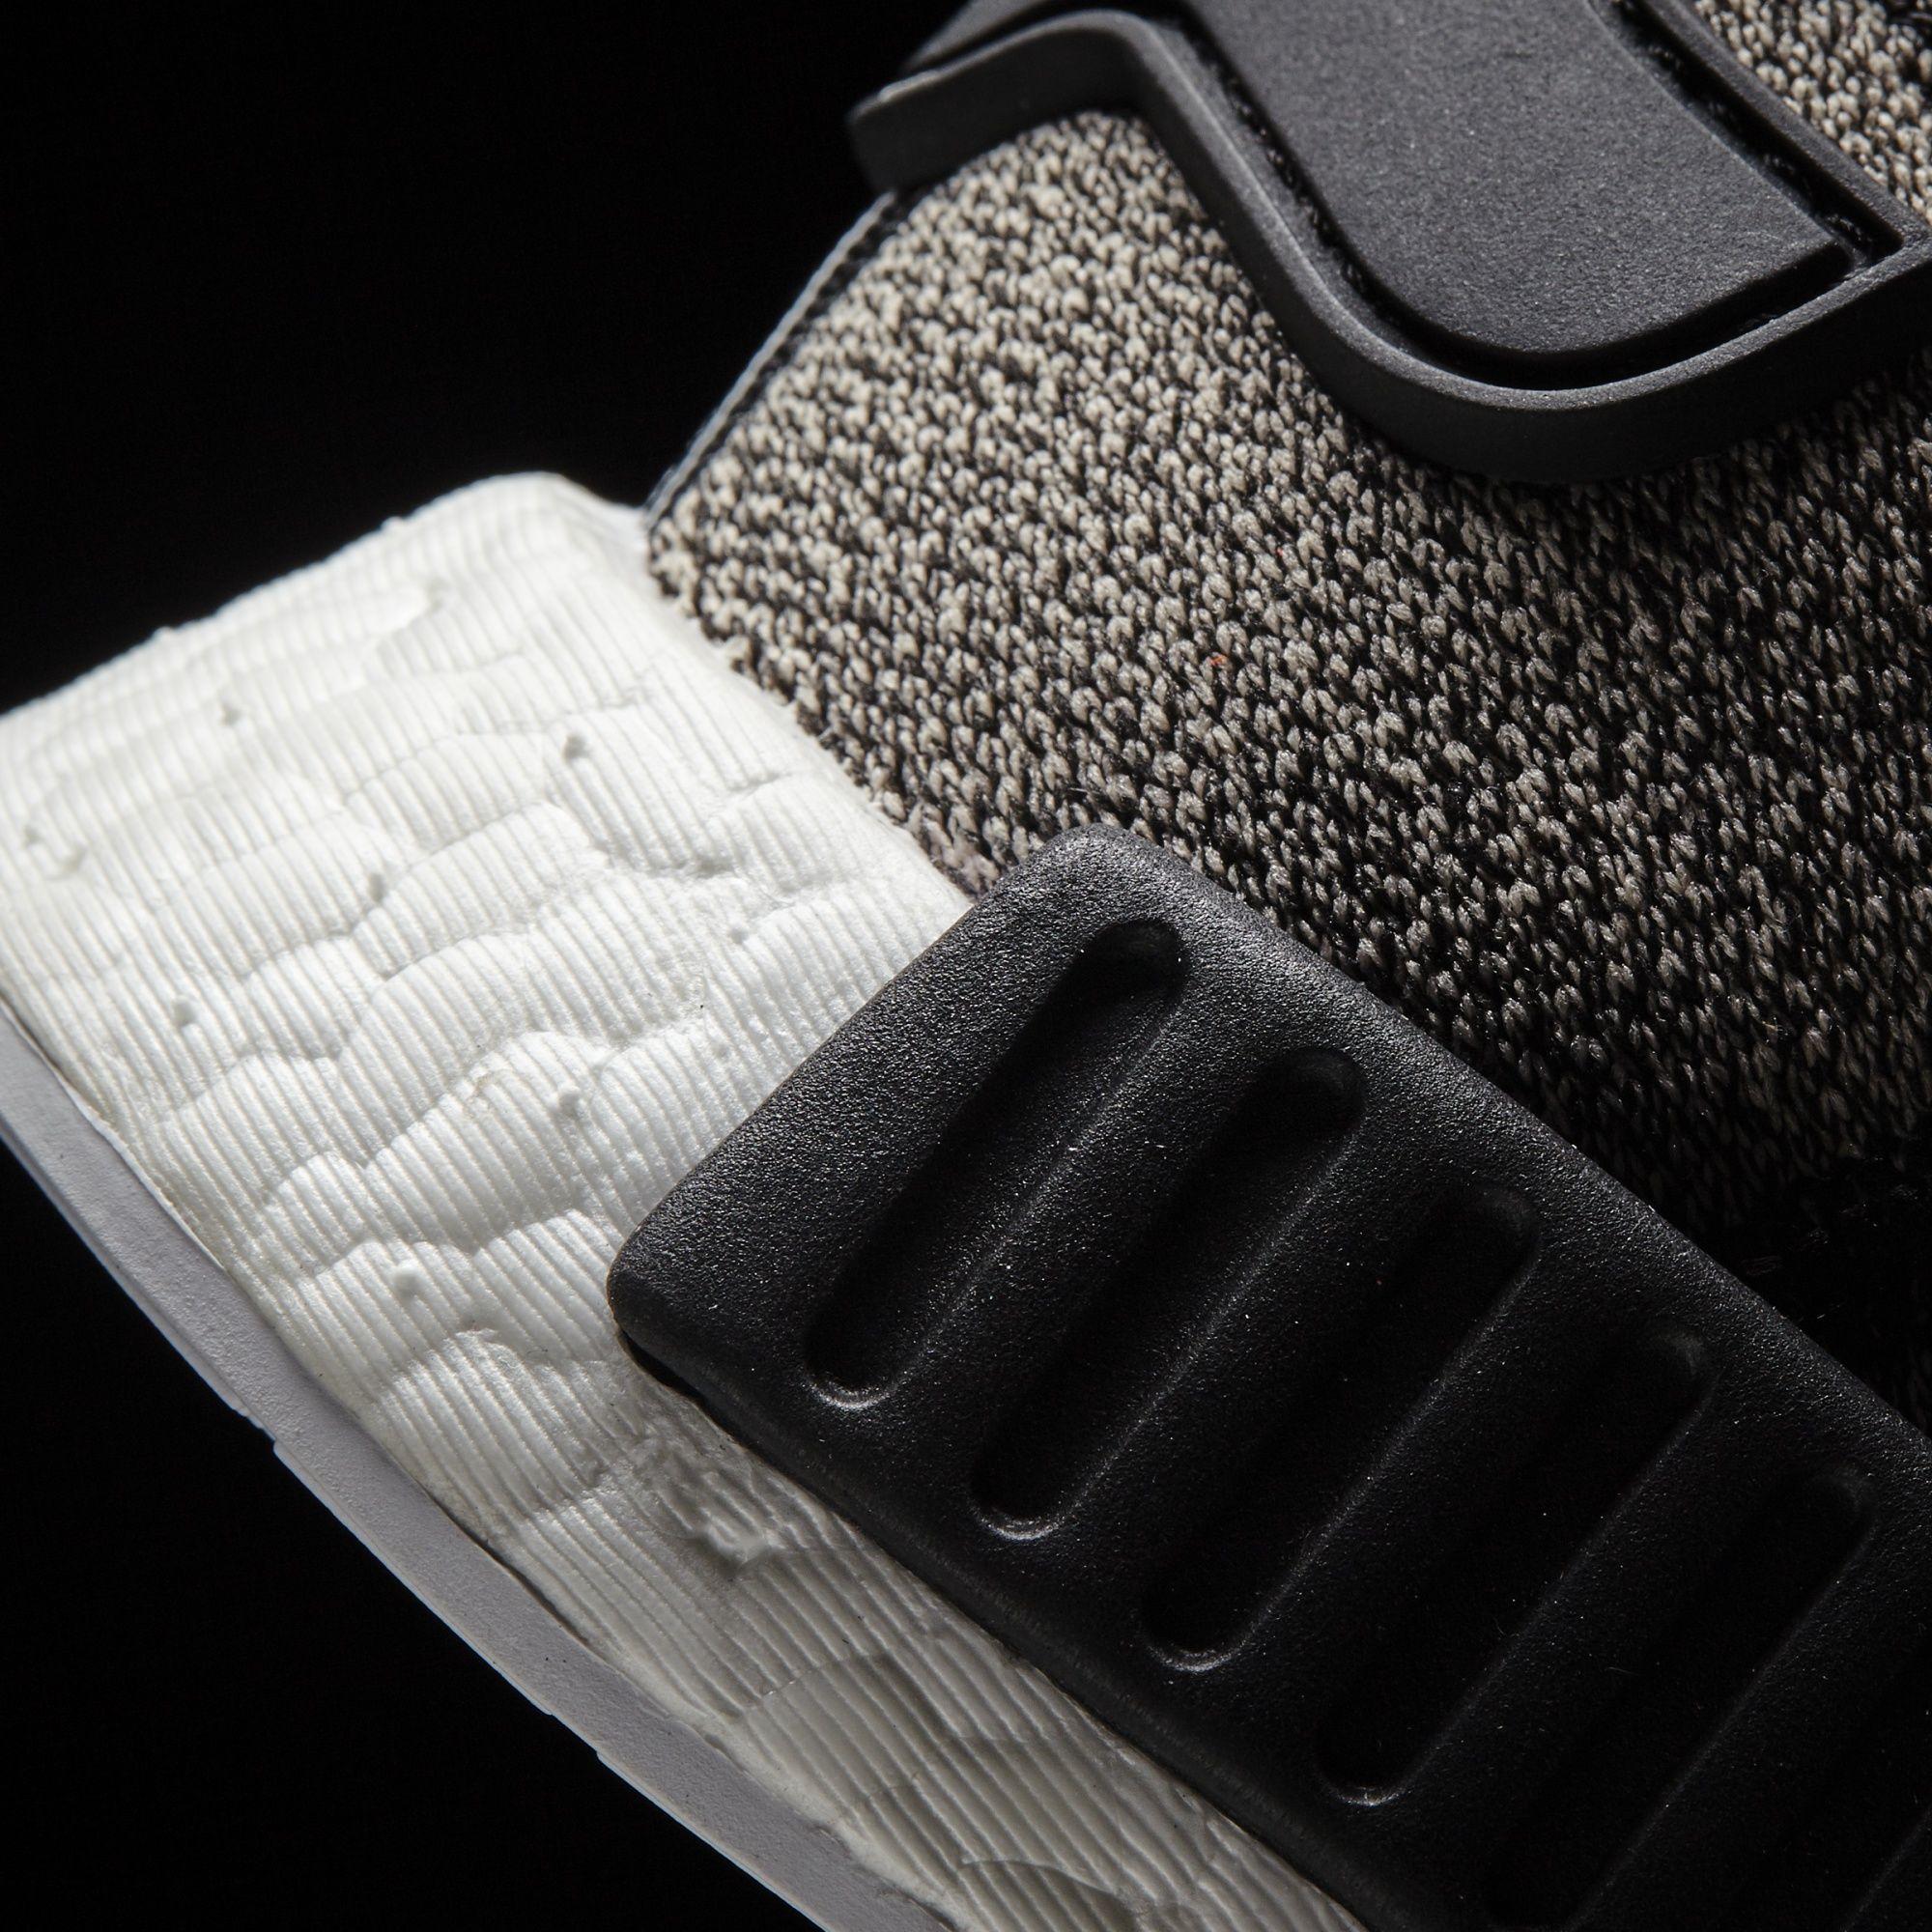 adidas NMD Black/White Reflective Heel